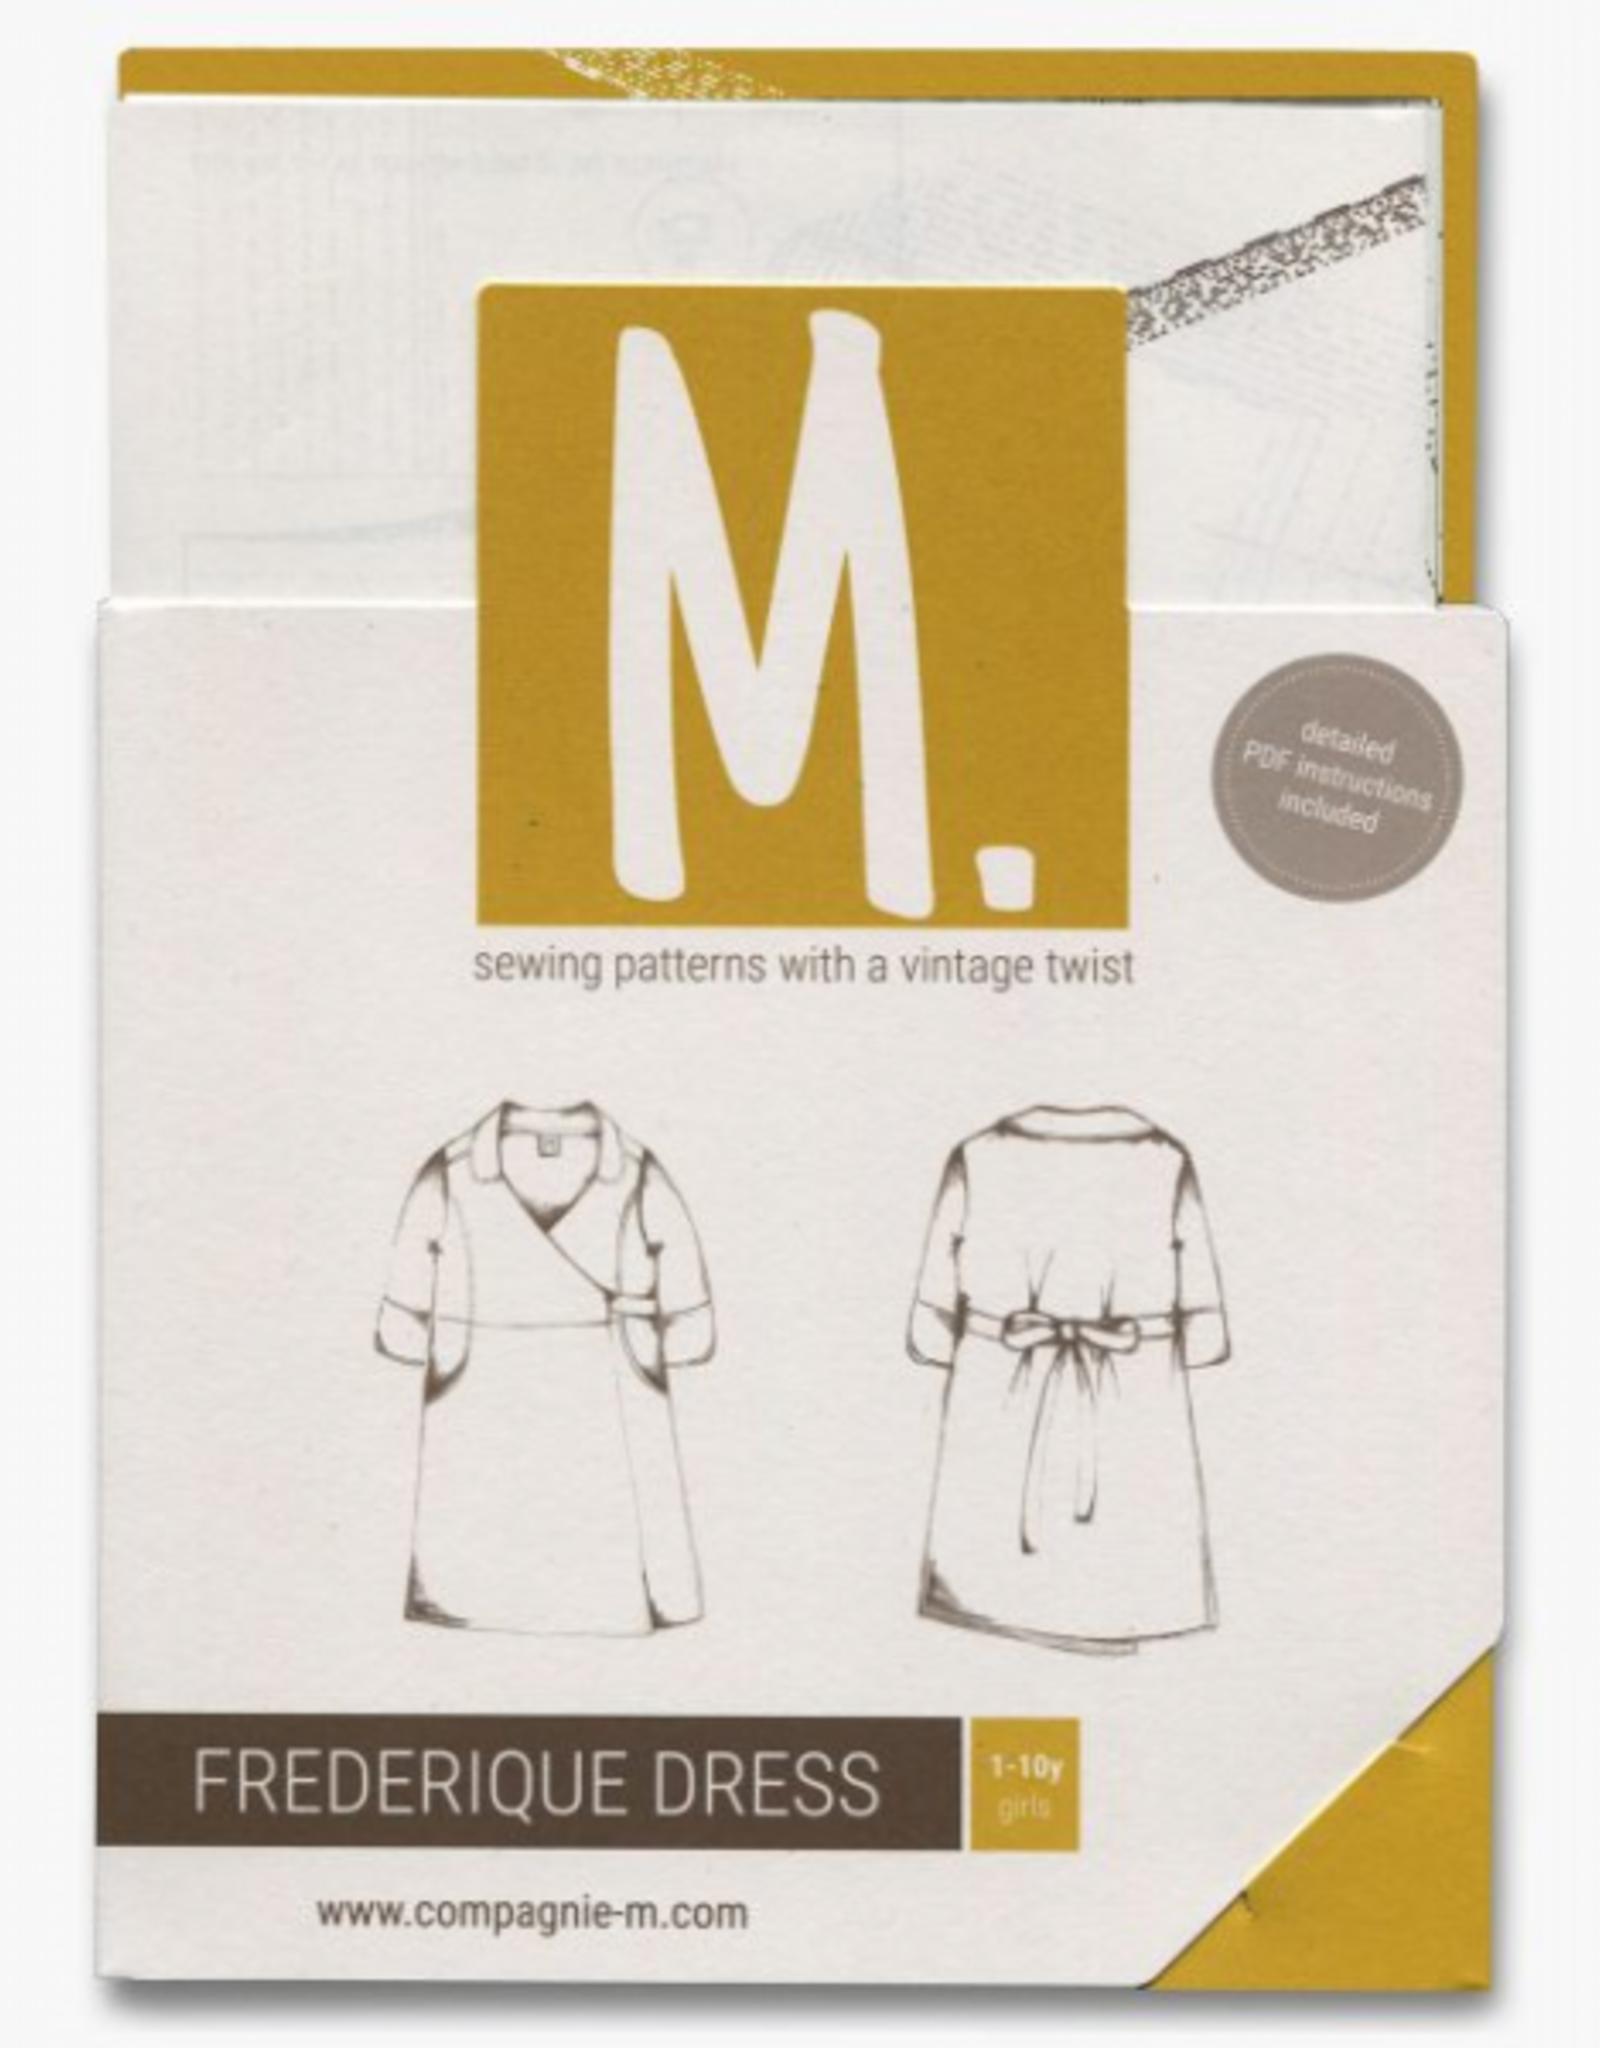 Compagnie M Compagnie M Frederique Dress kinderen